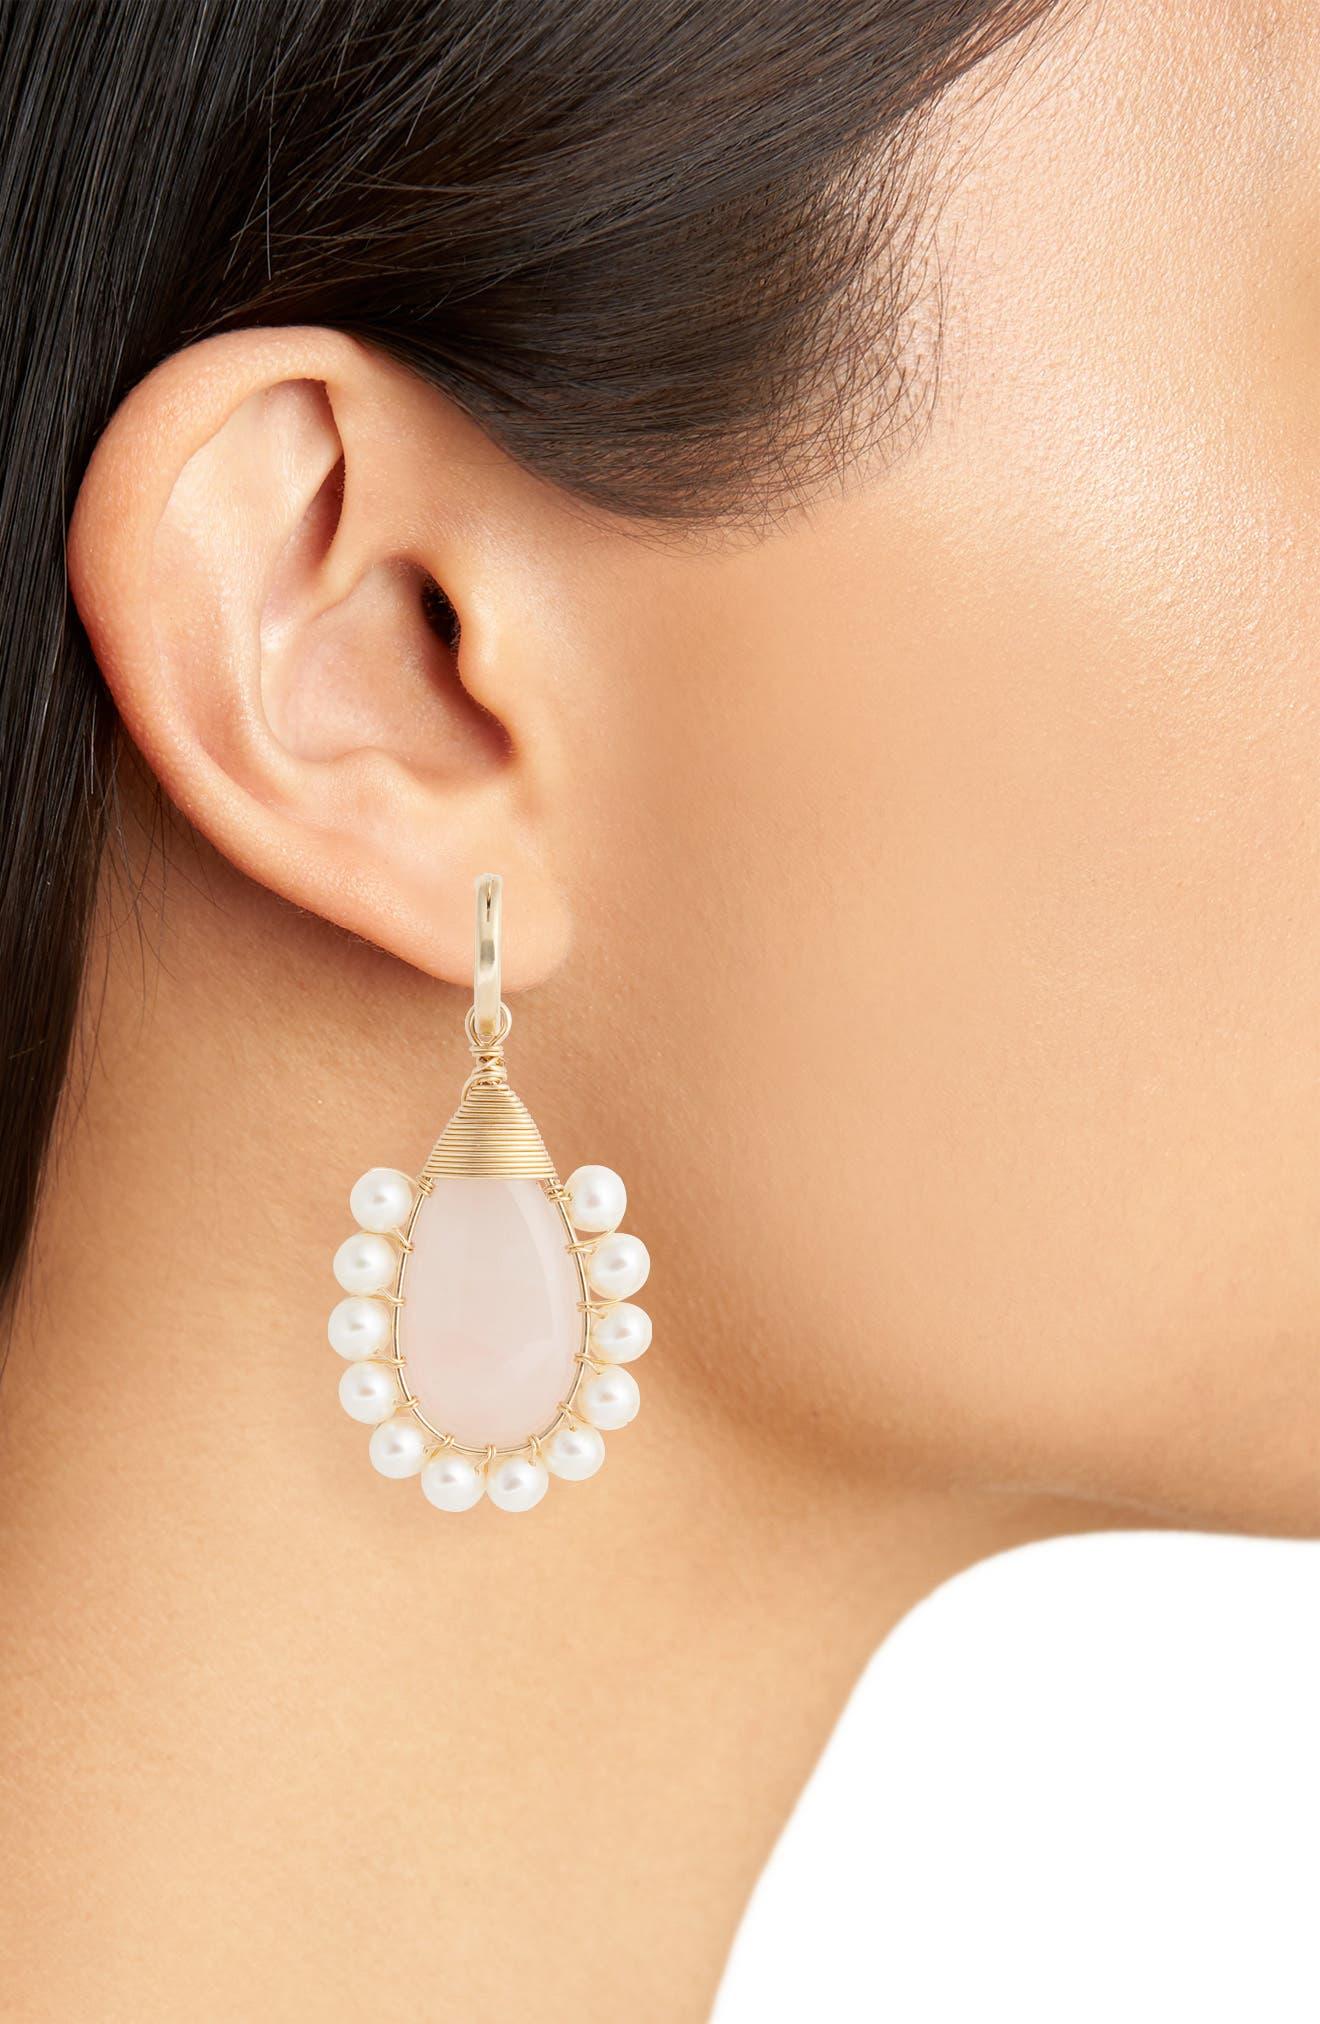 Lolita Rose Quartz & Freshwater Pearl Statement Earrings,                             Alternate thumbnail 2, color,                             ROSE QUARTZ